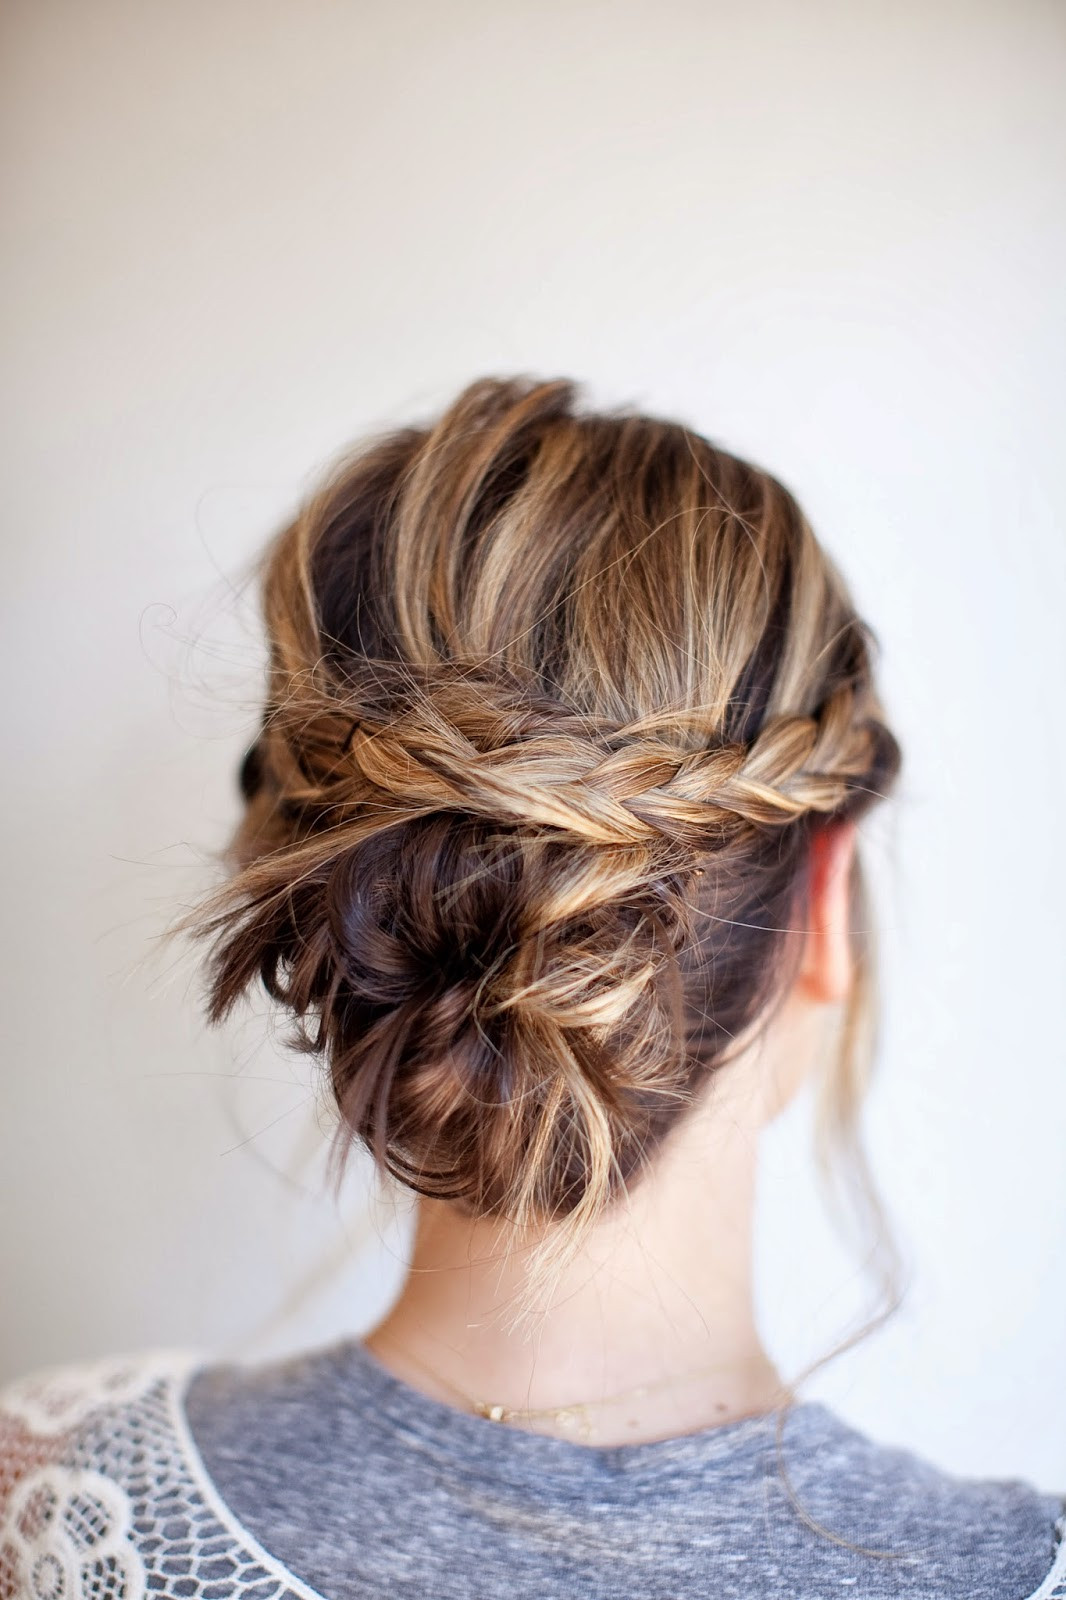 Best ideas about DIY Wedding Updo . Save or Pin TESSA RAYANNE THREE DIY Bridal Hair Tutorials Now.